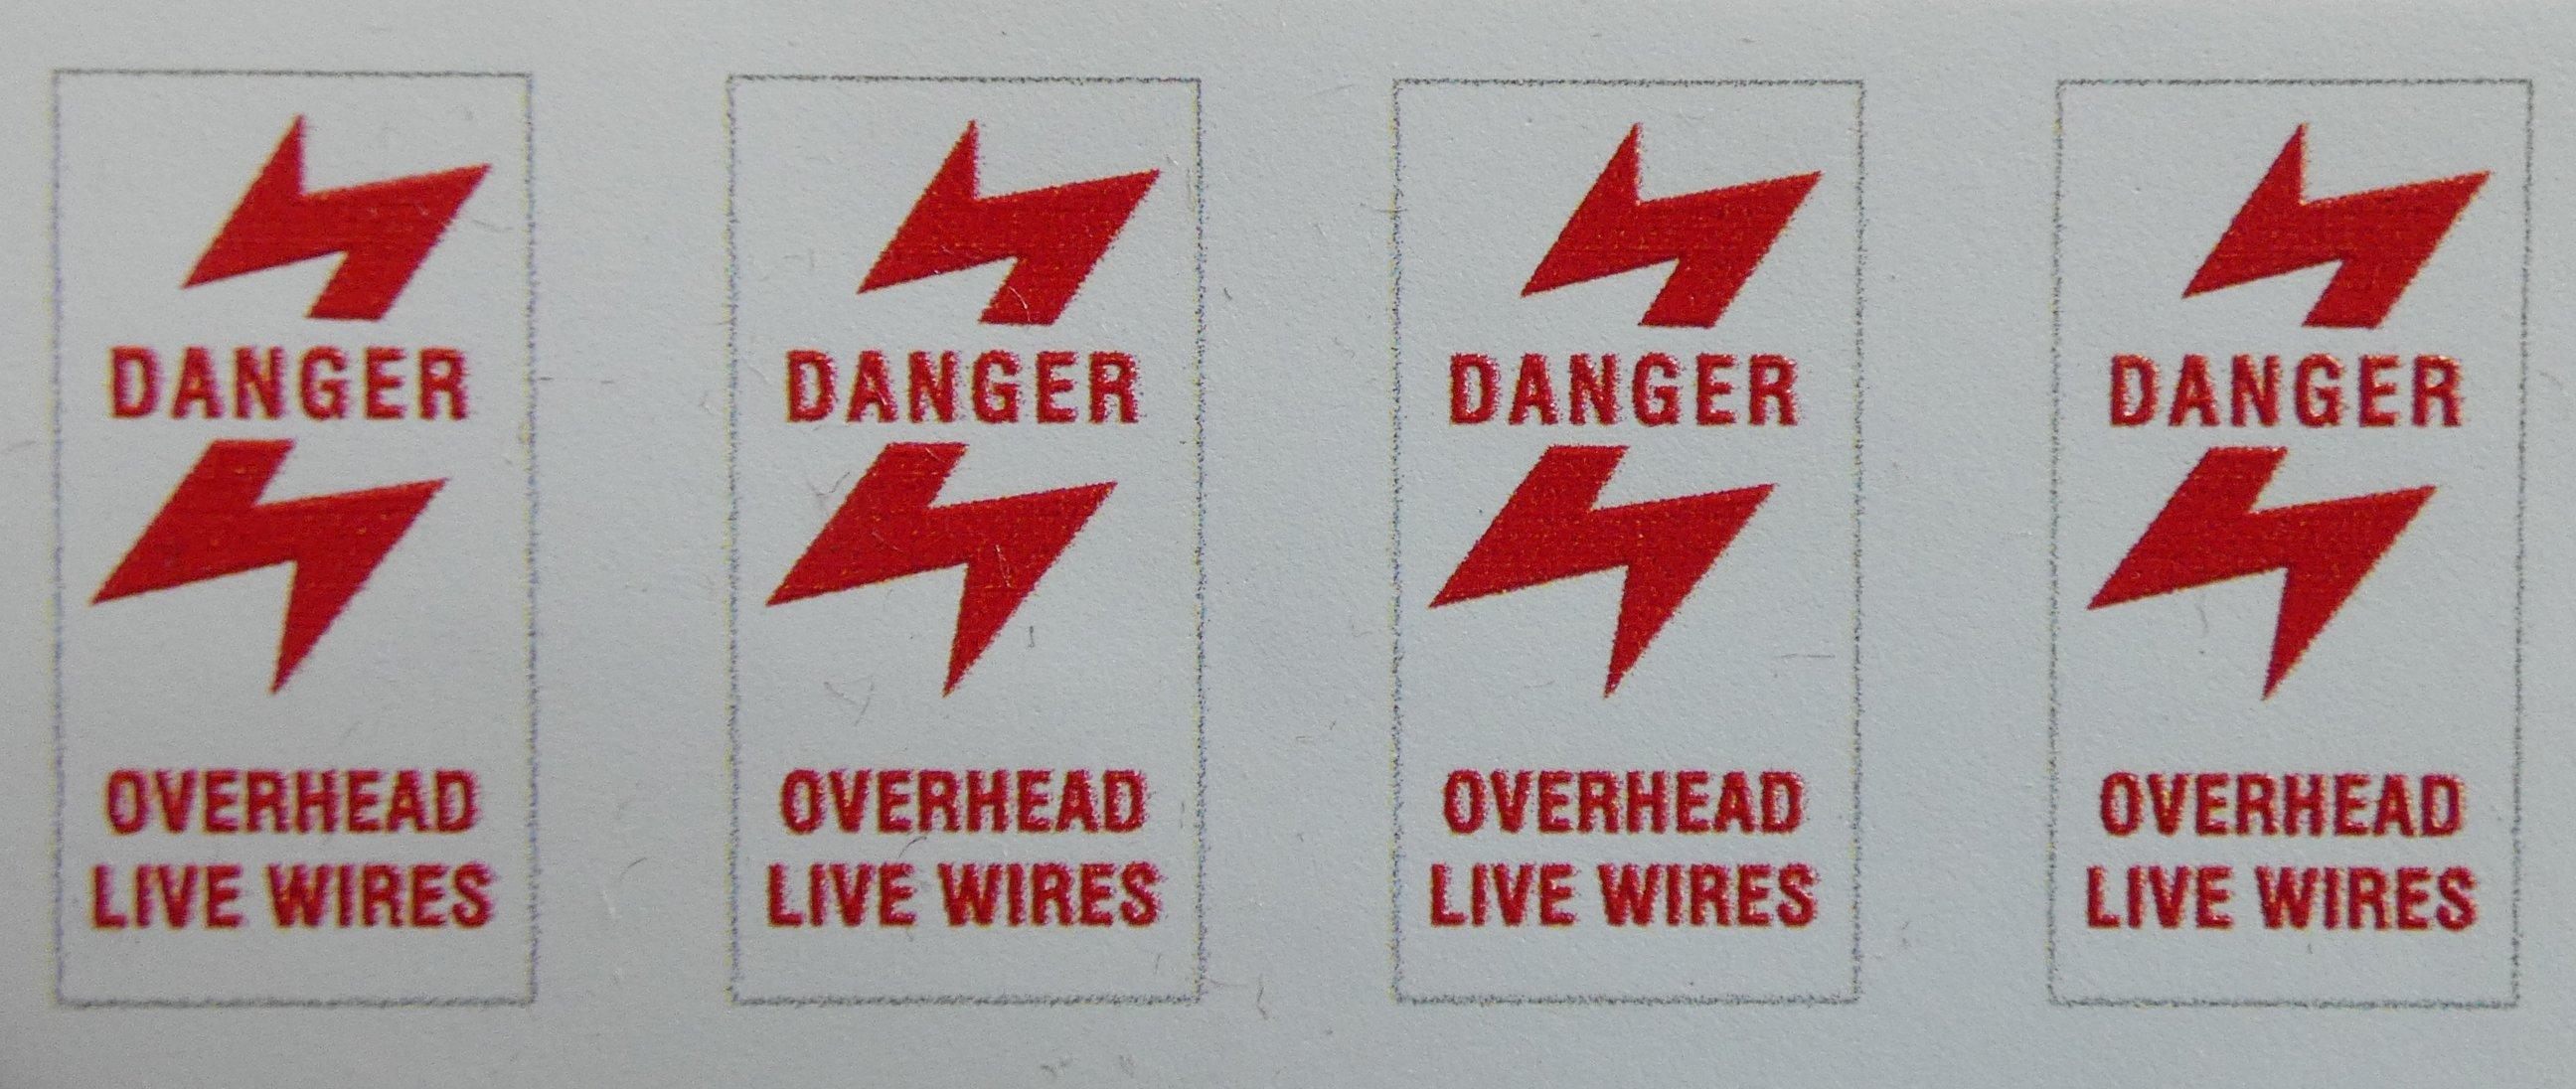 OVERHEAD LIVE WIRE WARNING DECALS 5 Inch Gauge Self Adhesive Vinyl